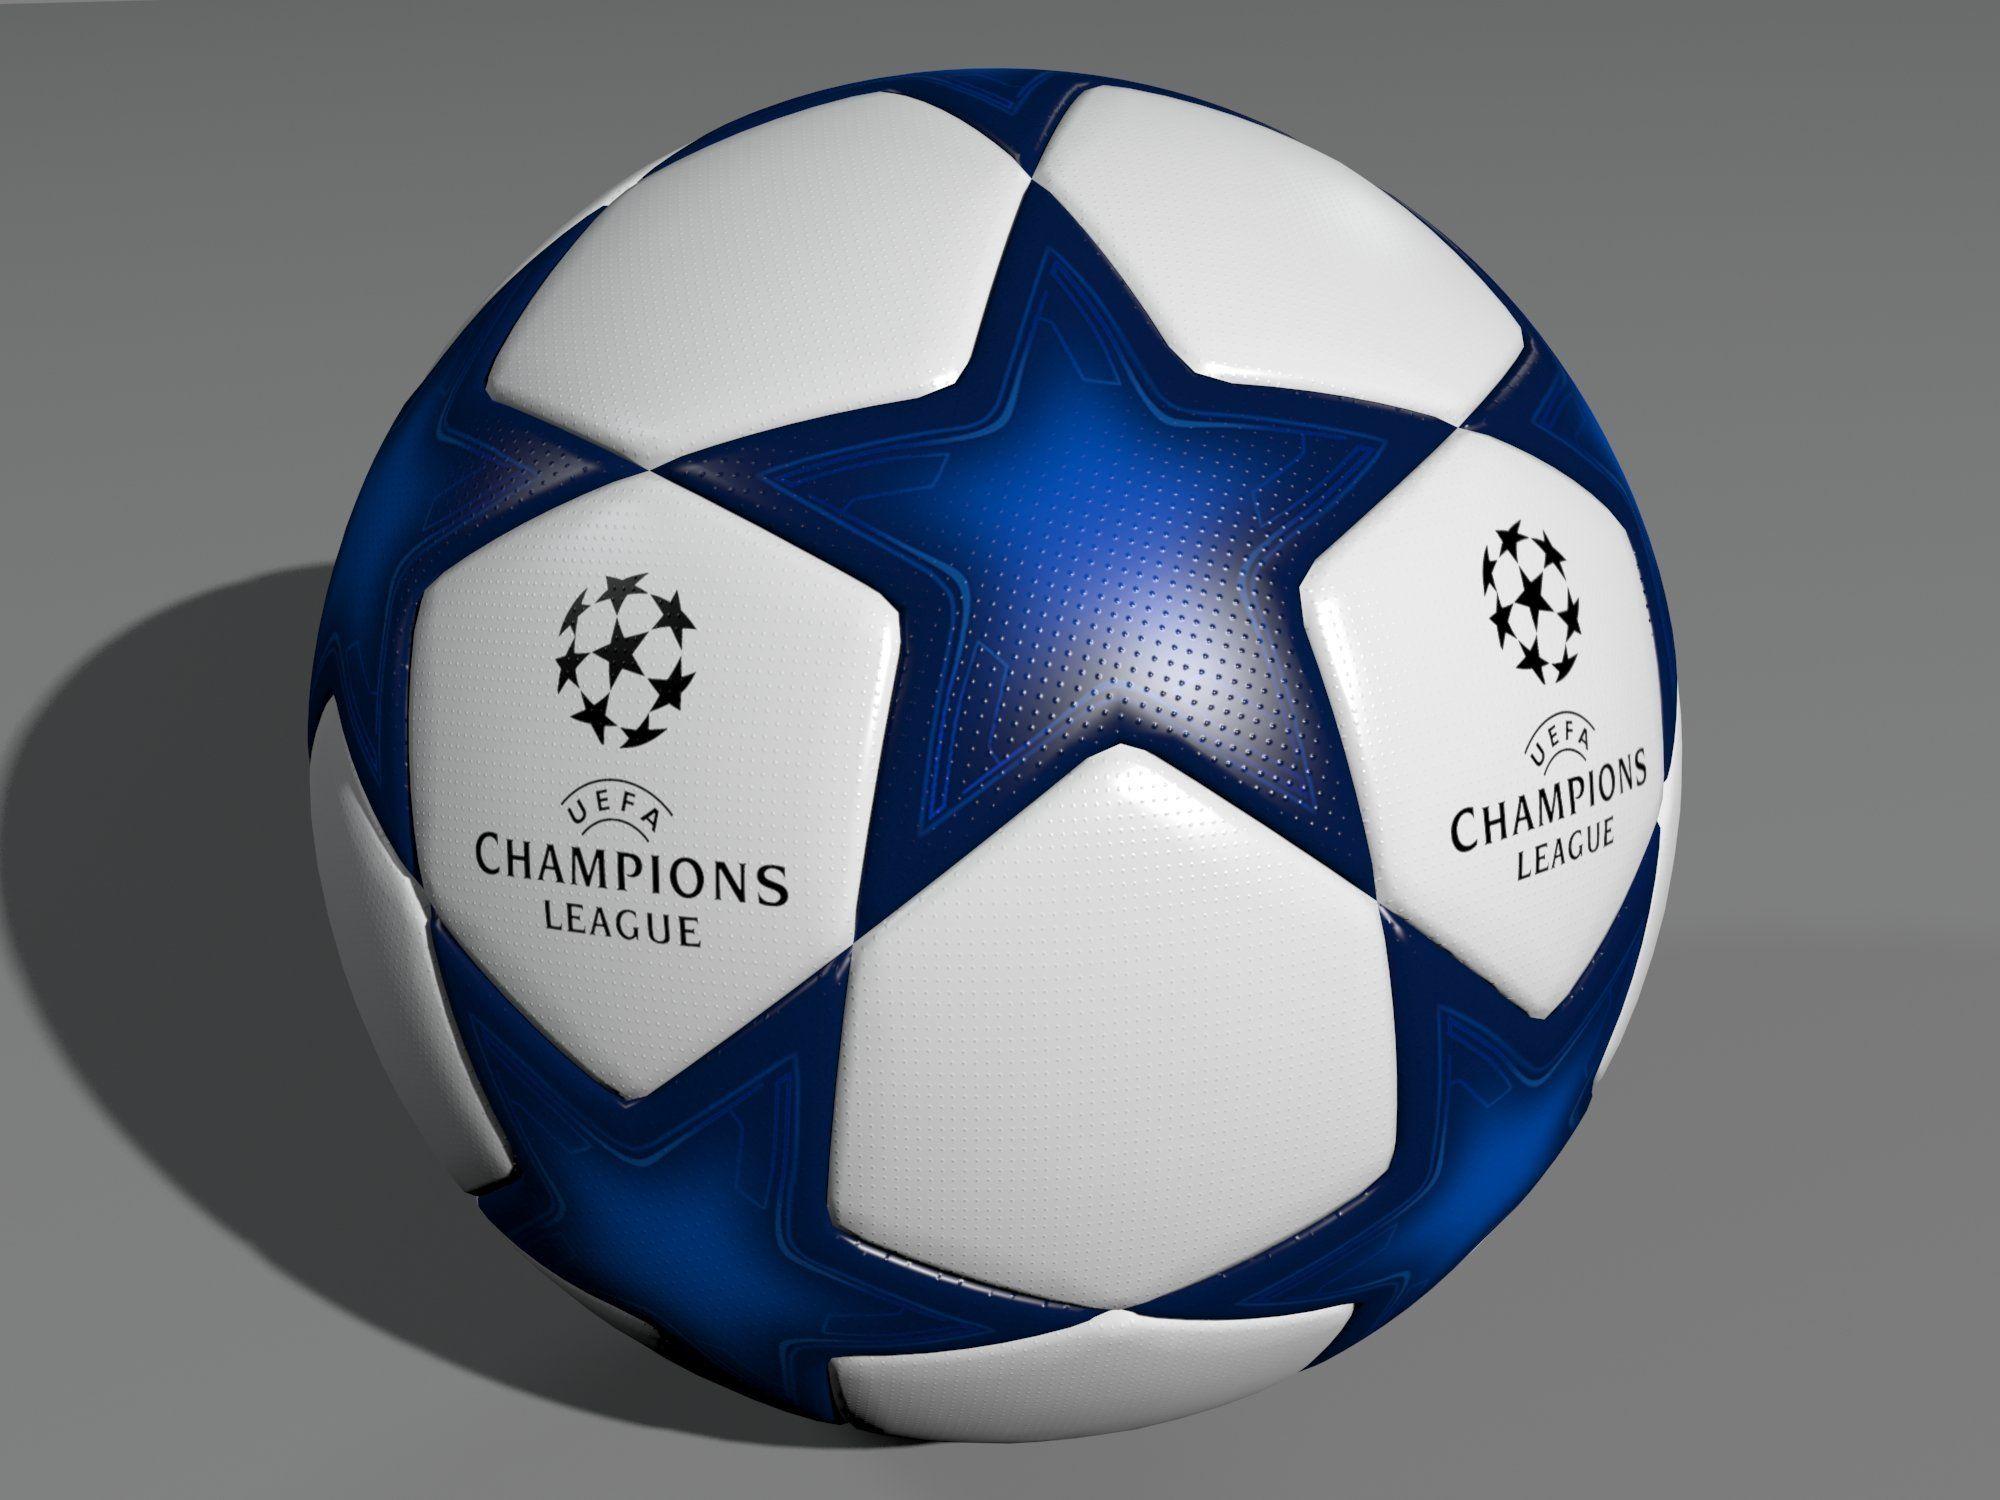 uefa champions league ball 3d model uefa champions league champions league league pinterest